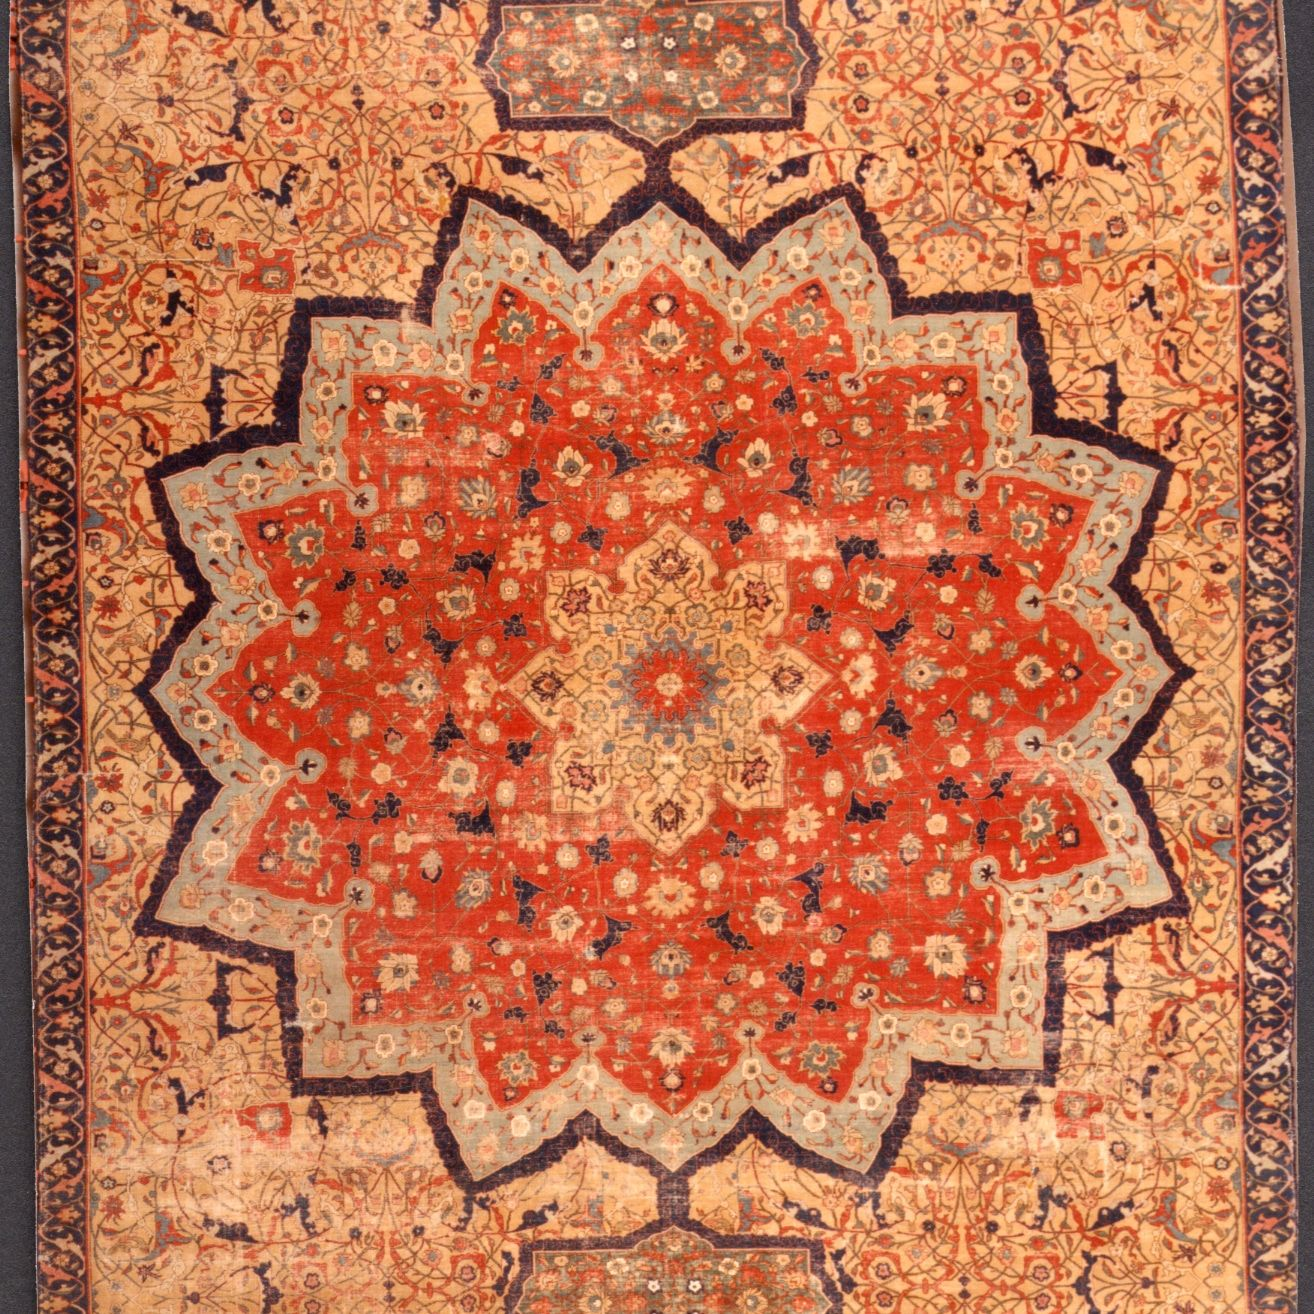 Tapis persan de Tabriz, circa 1511 - 1544 © Les Gobelins